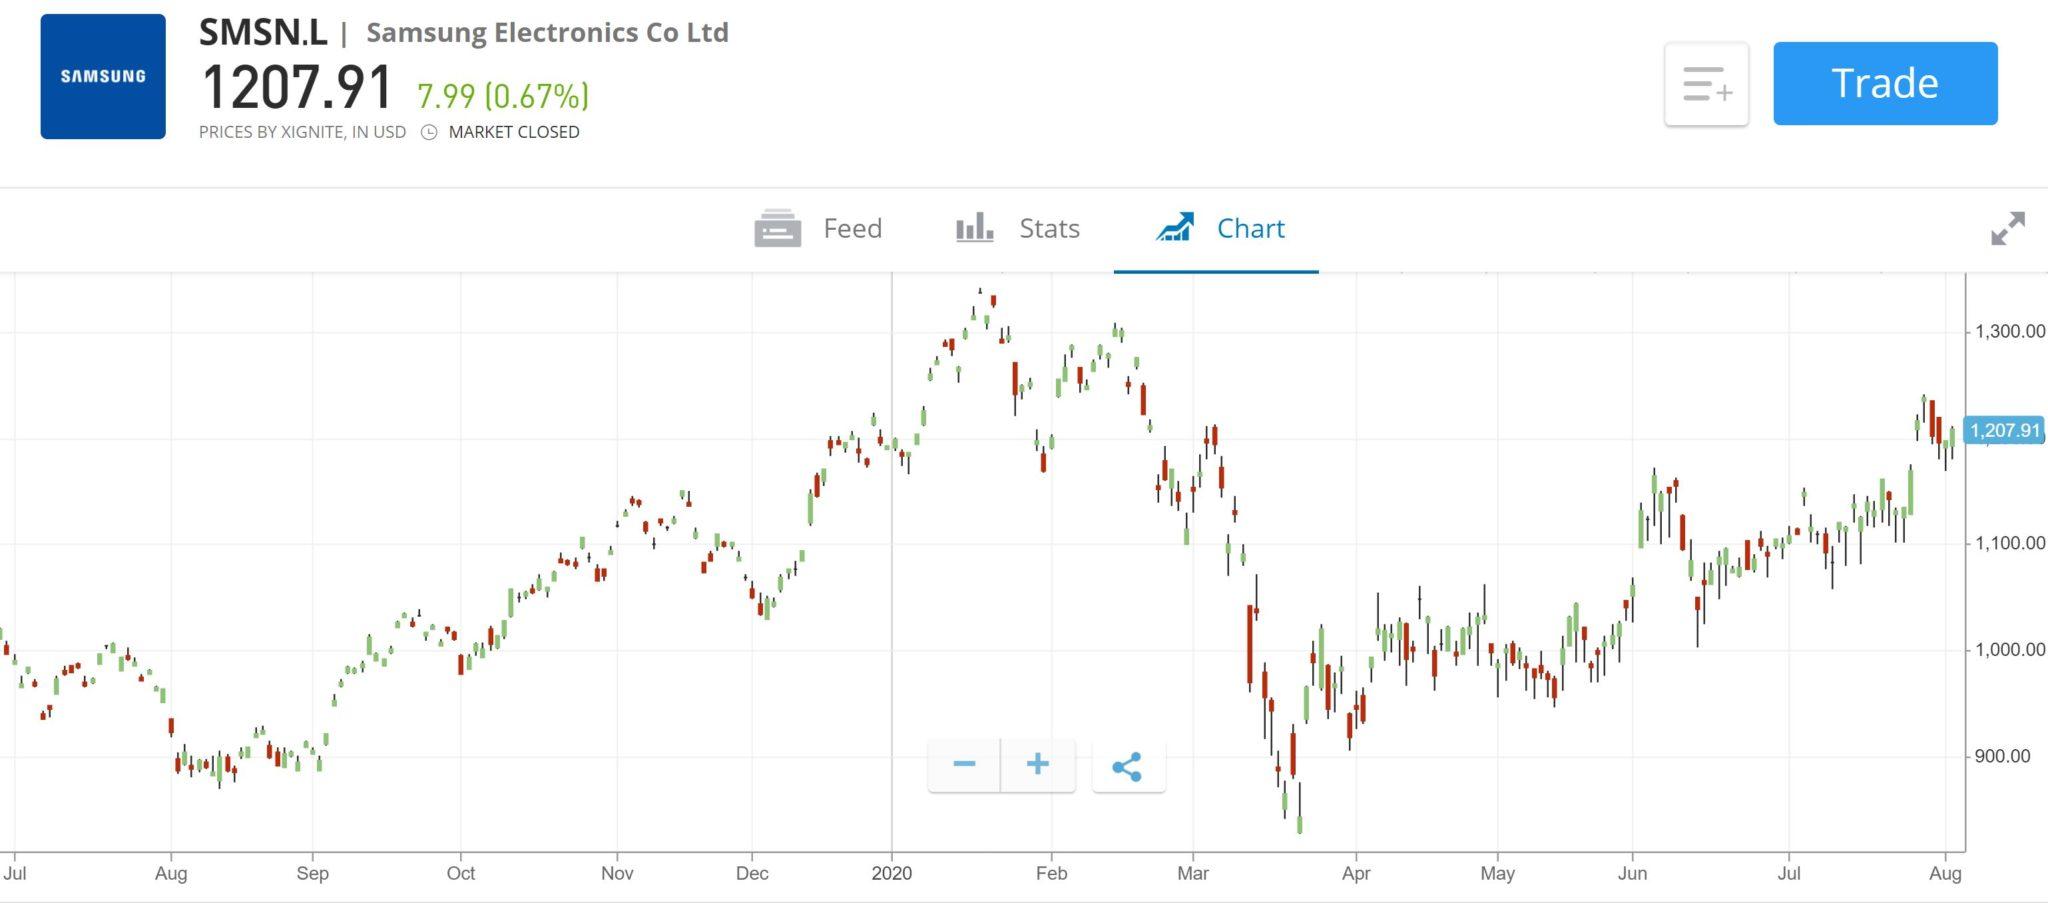 Samsung price chart on eToro